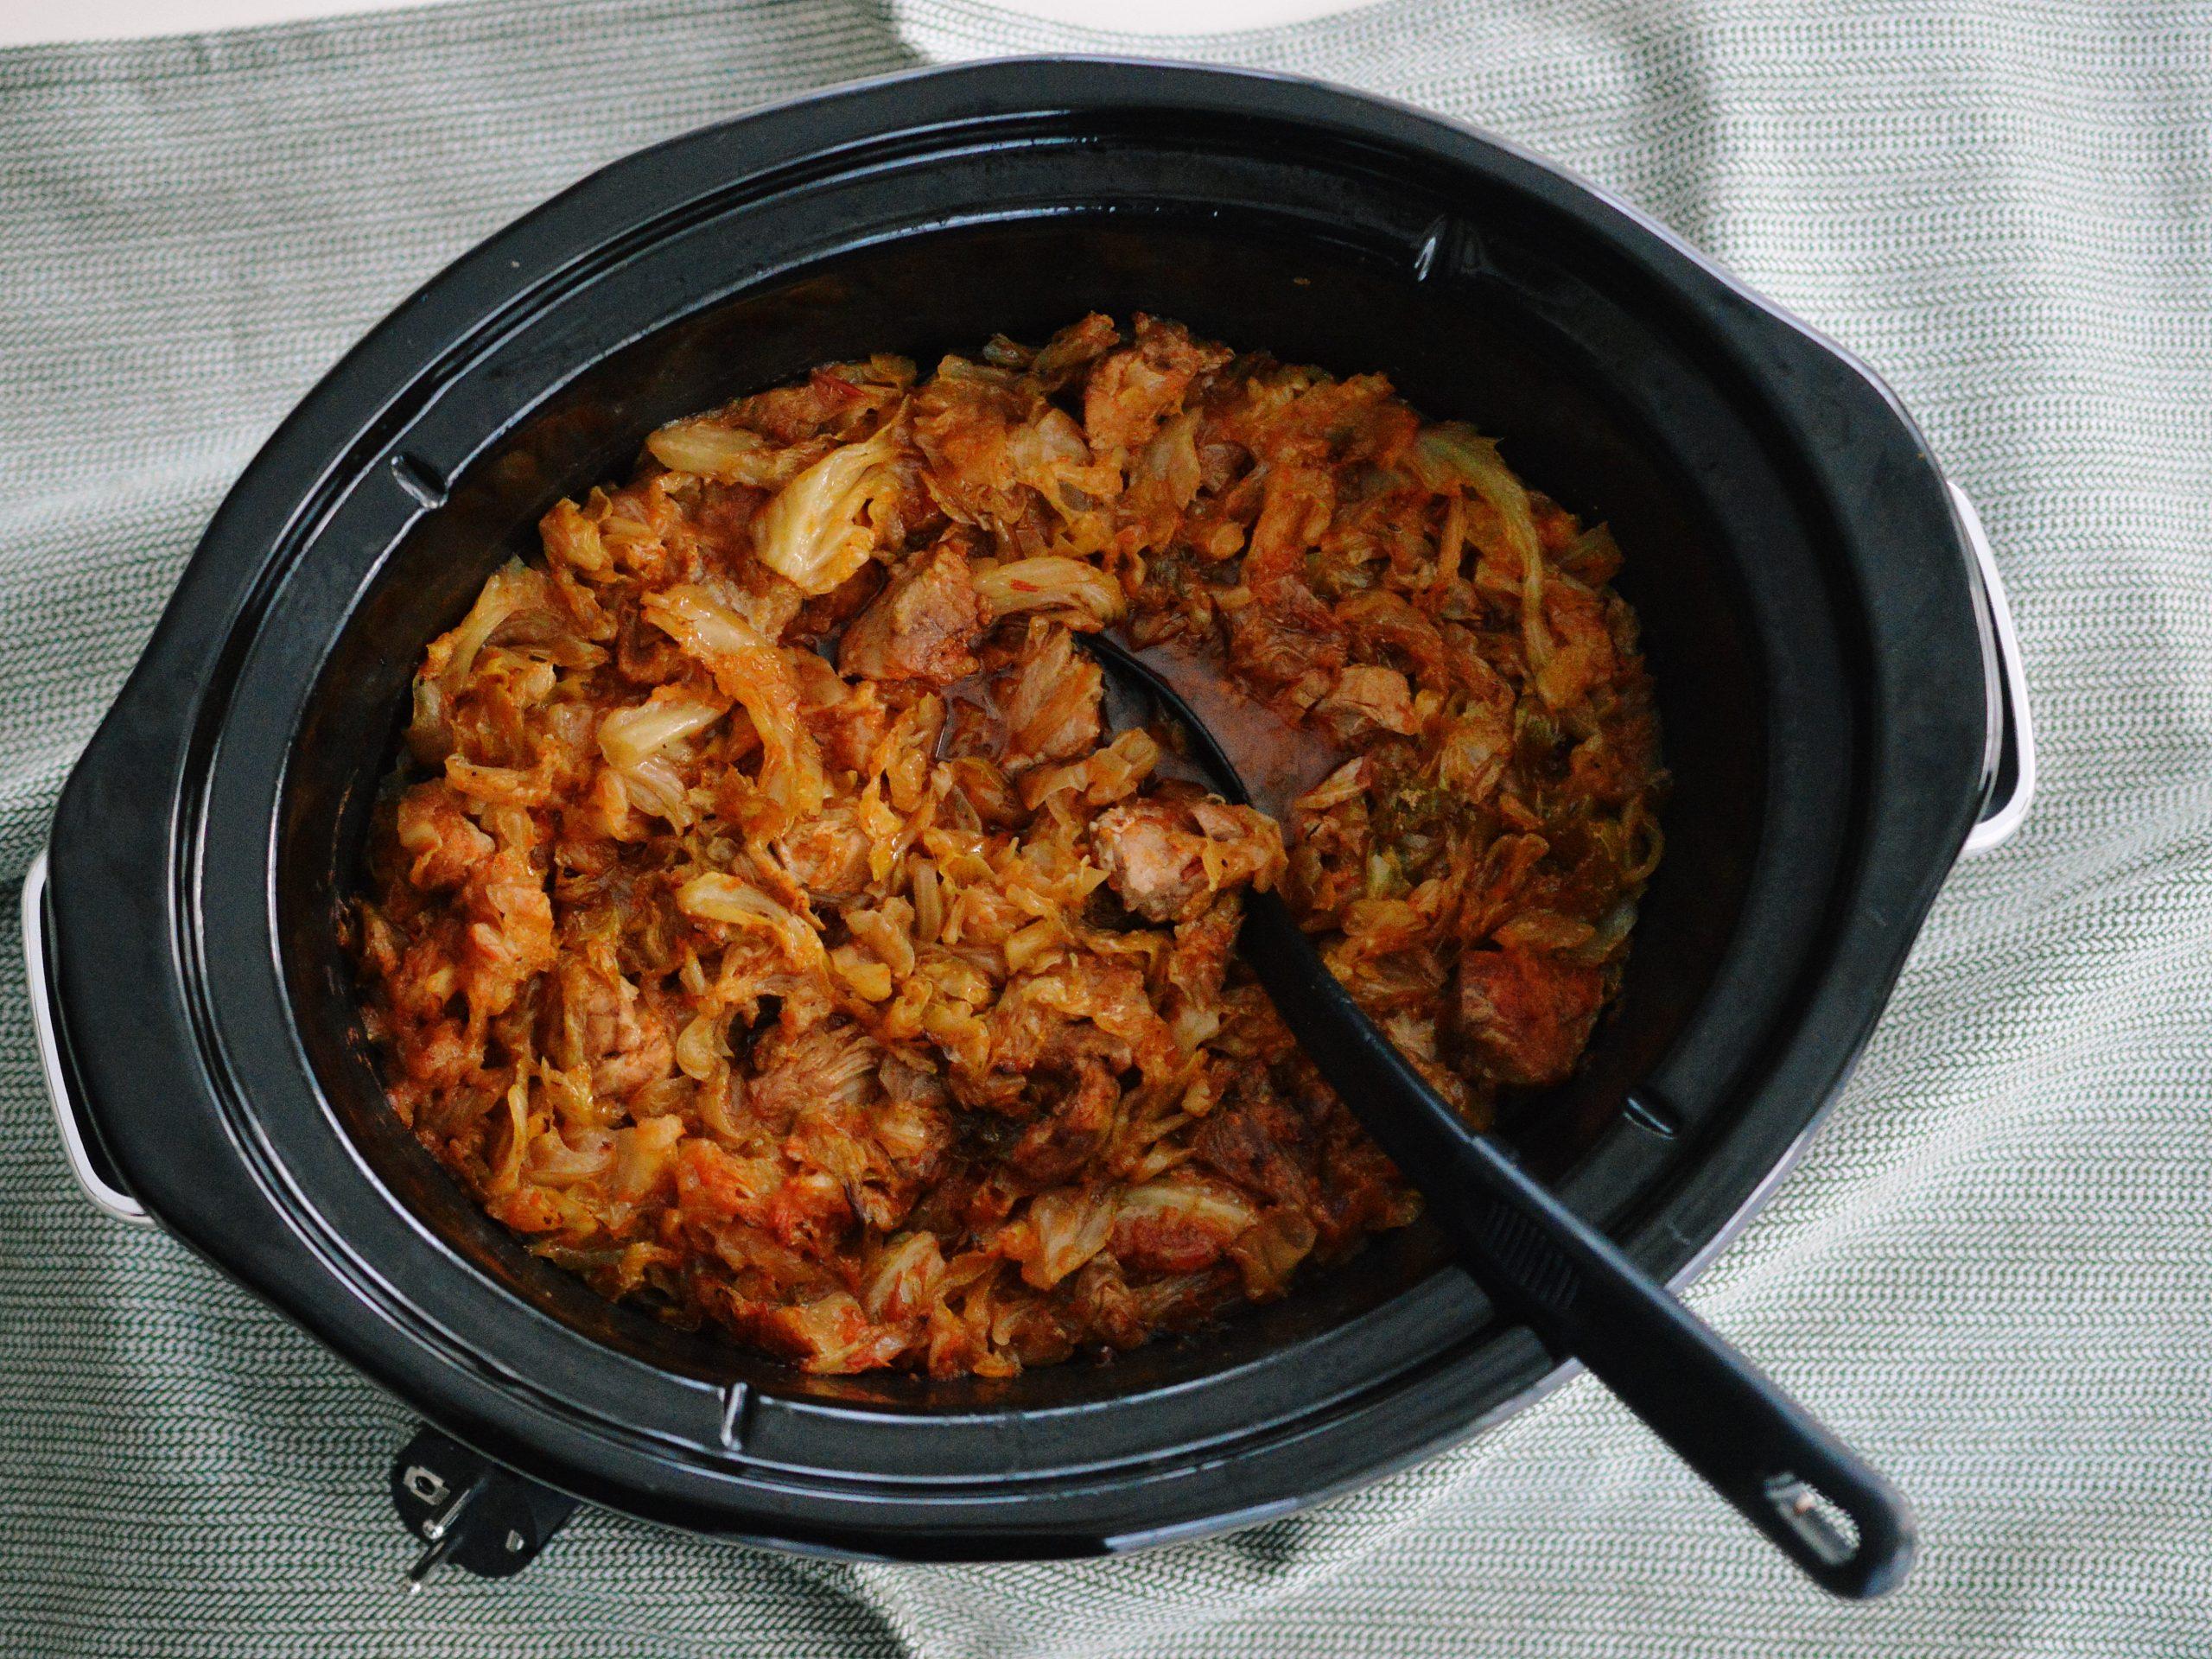 Varza murata cu carne la Slow Cooker 5.6L Digital TimeSelect Crock-Pot